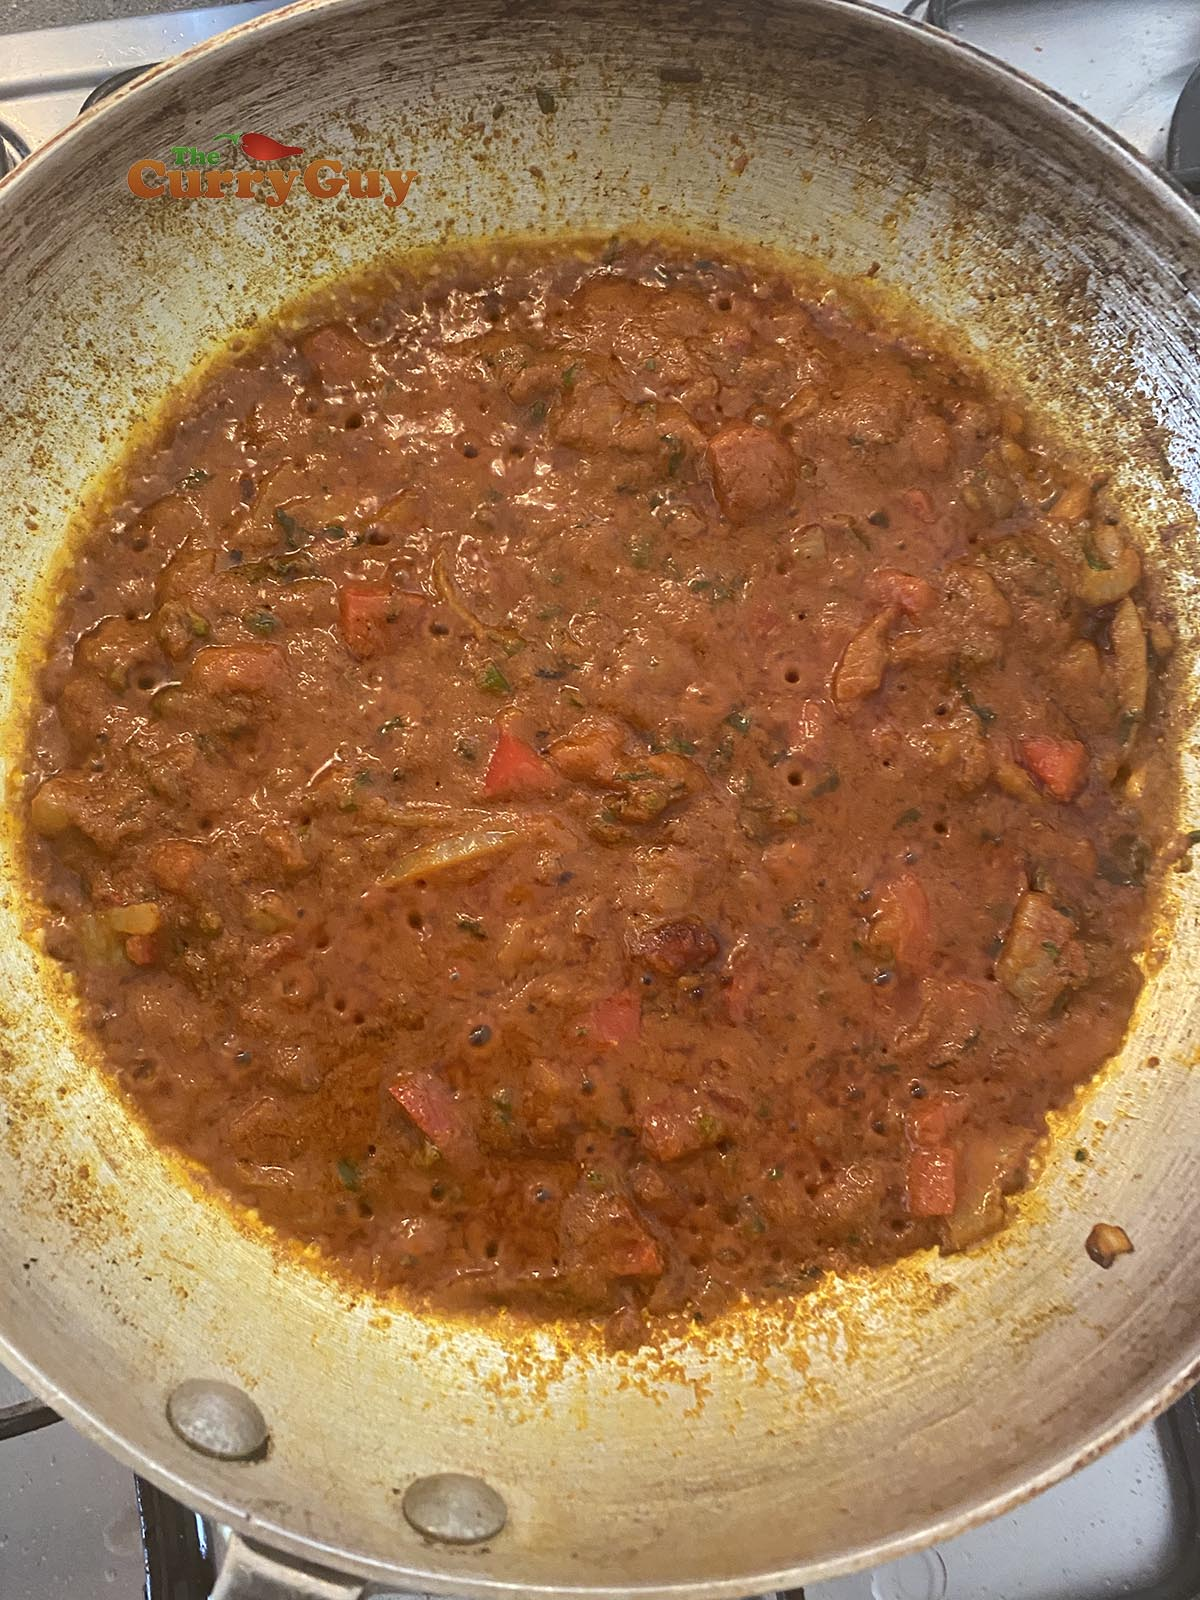 Adding tomato puree to pan